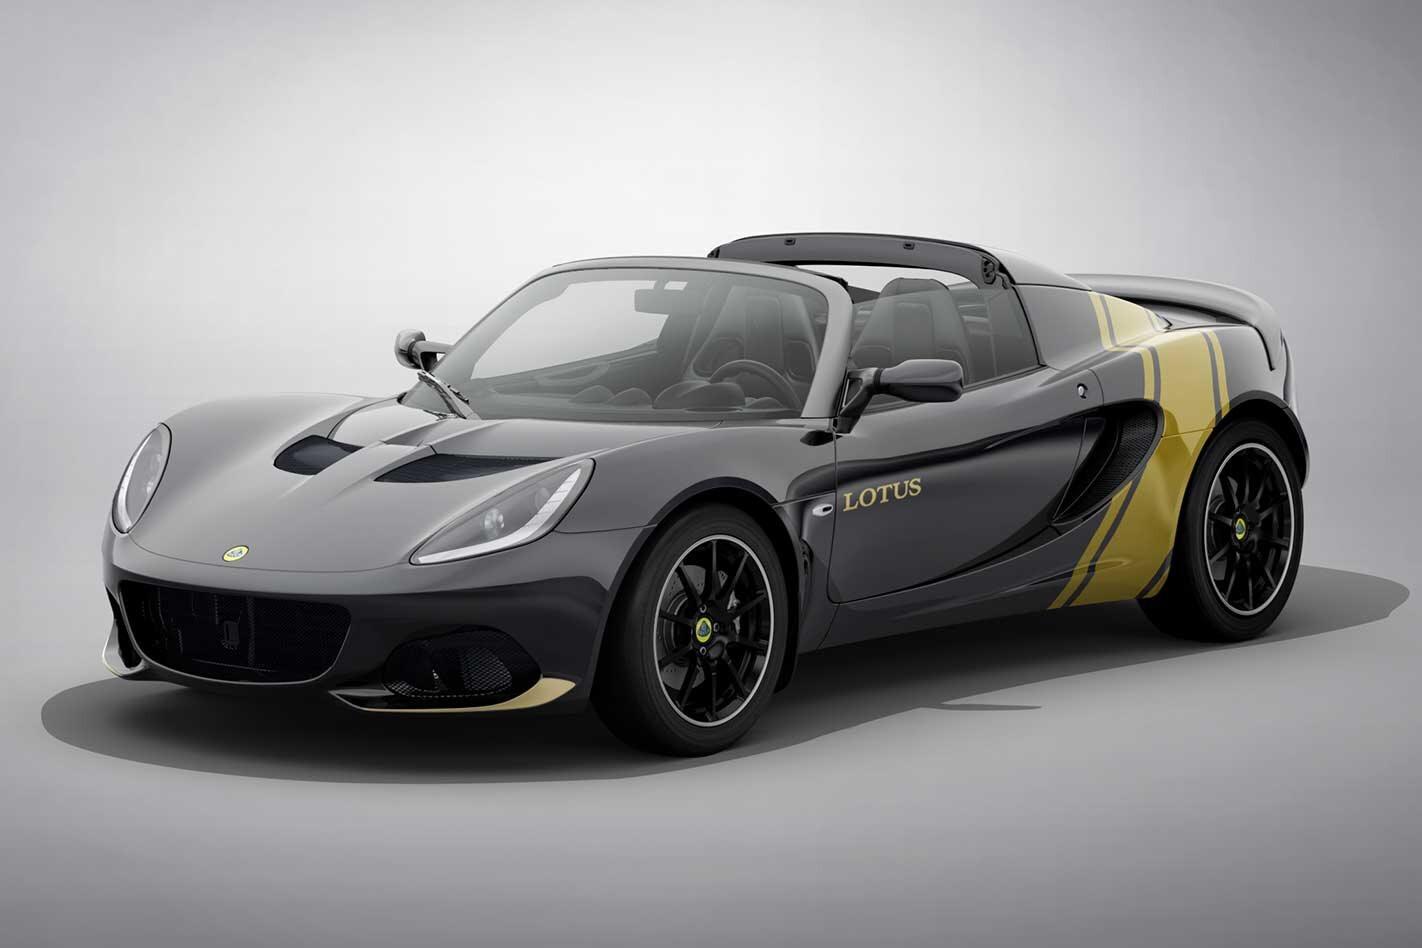 Lotus Elise Classic Heritage Editions revealed